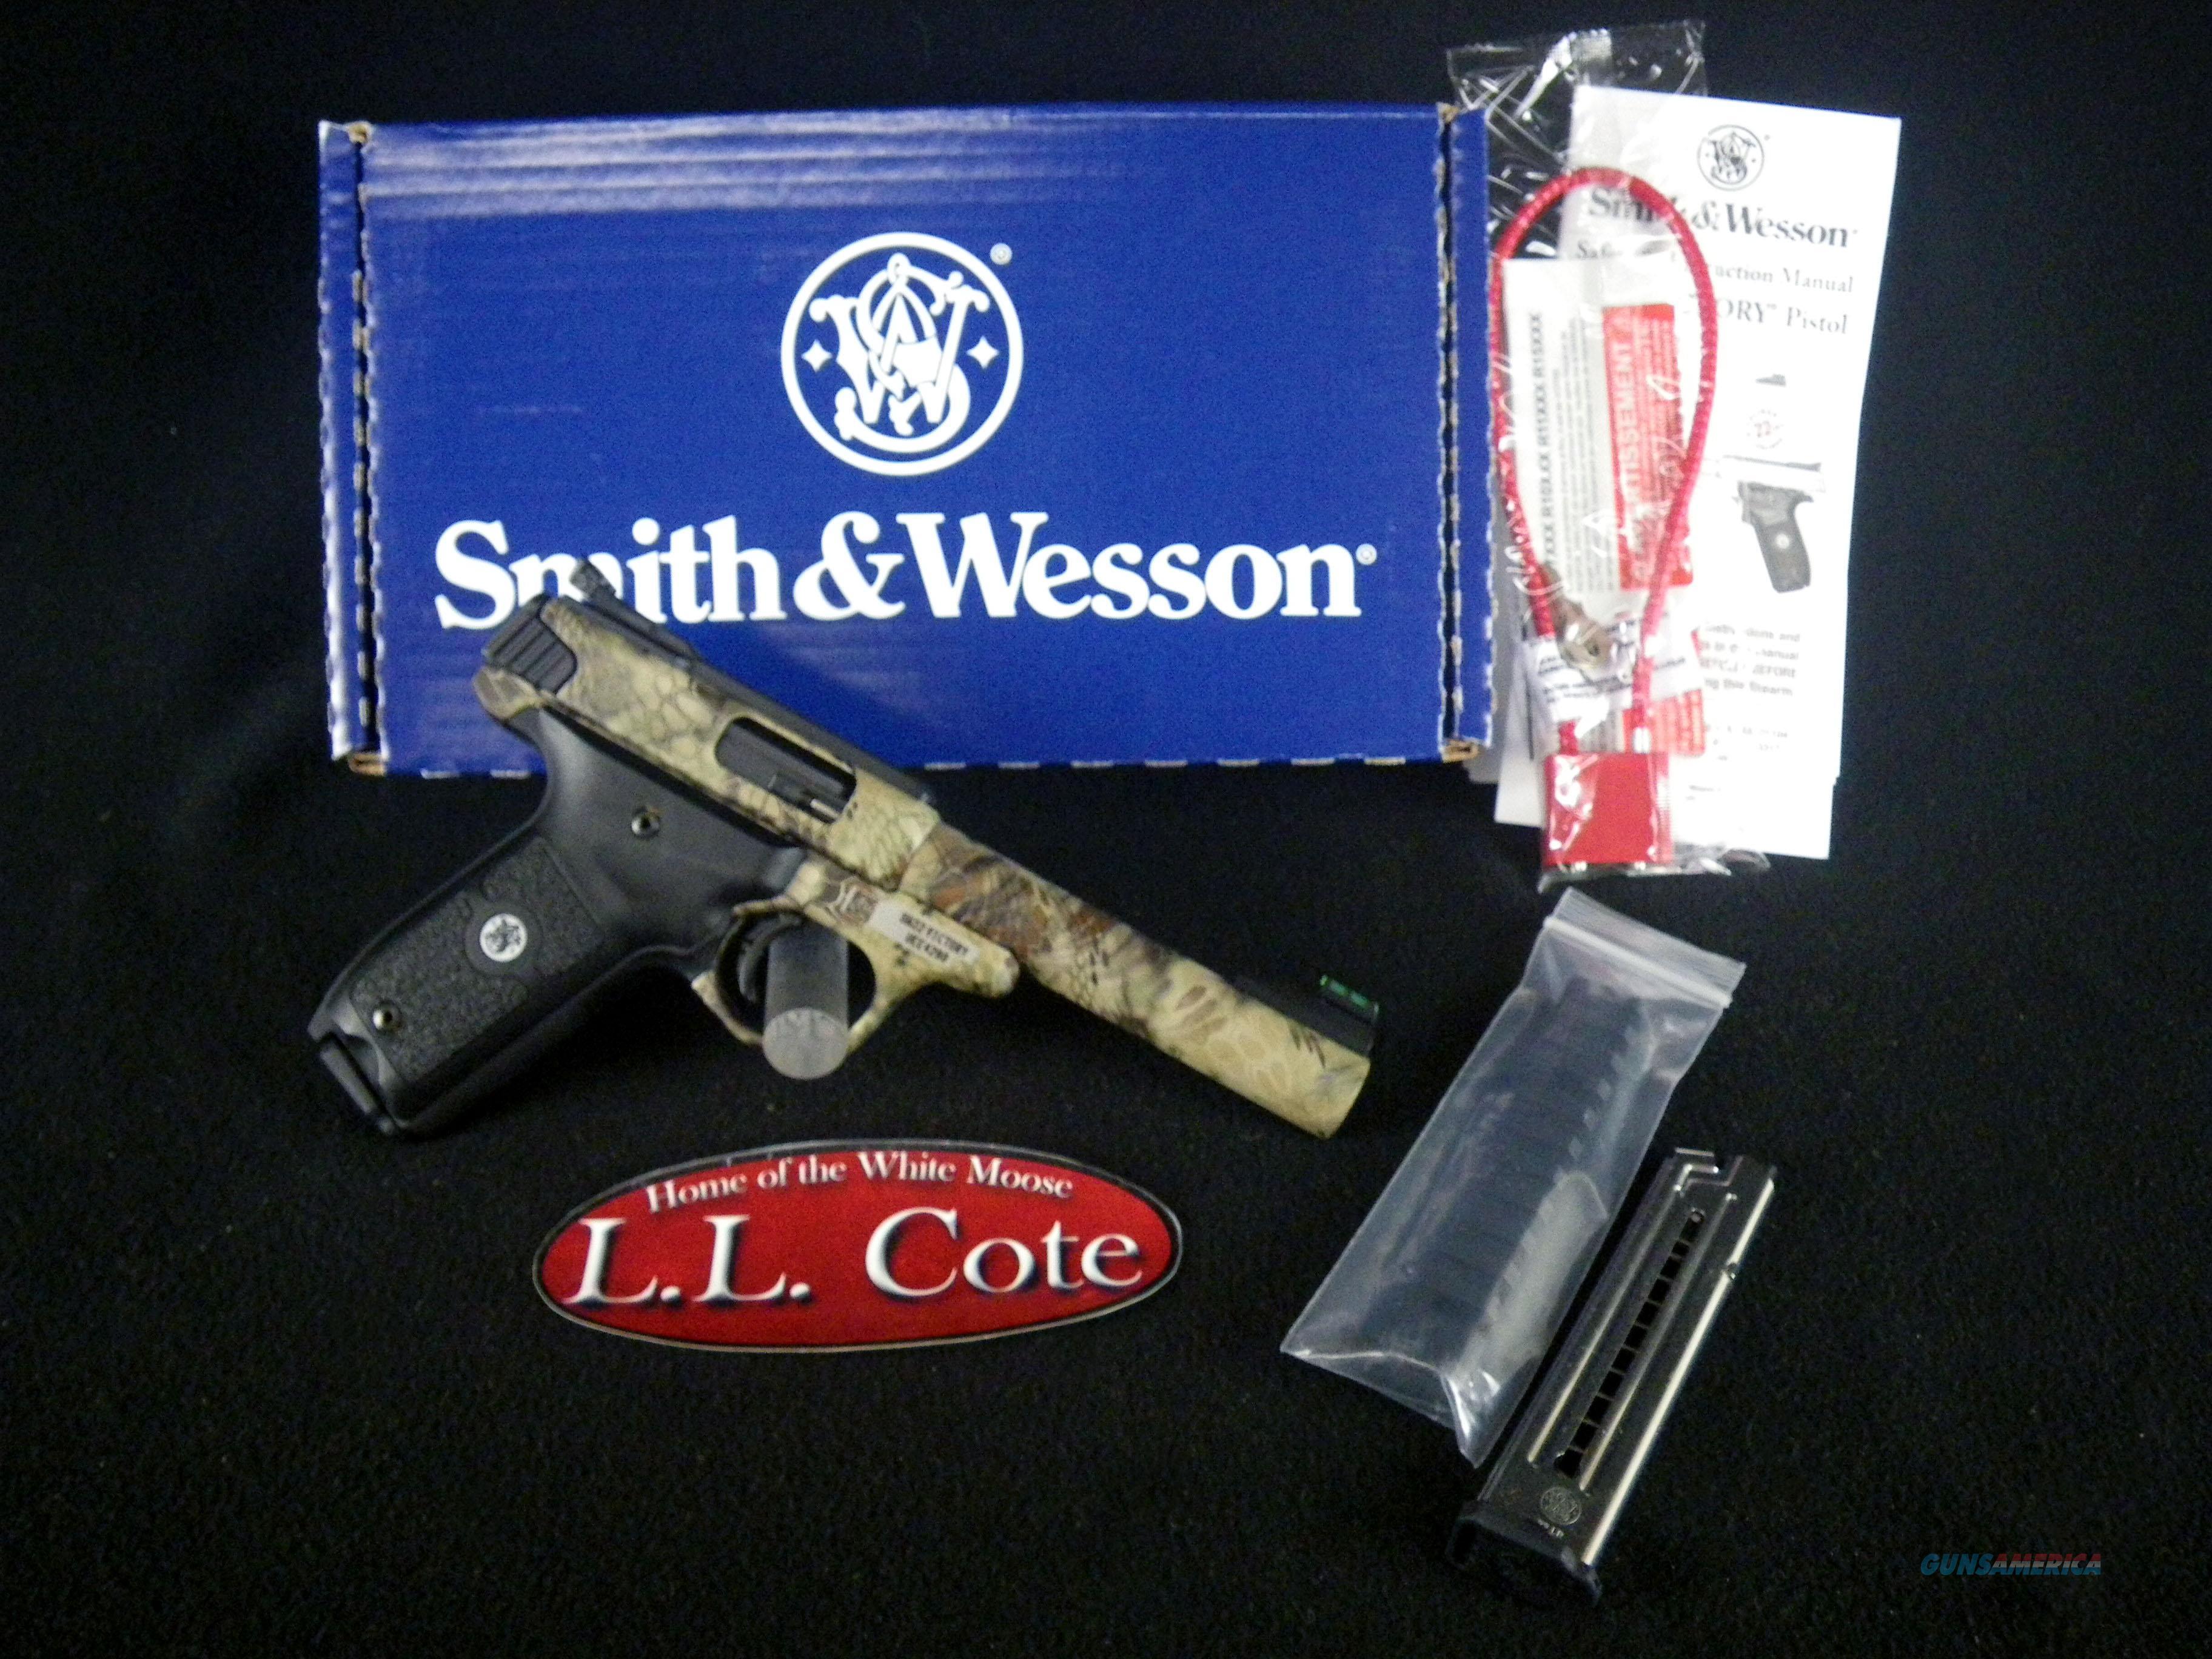 "Smith & Wesson SW22 Victory Kryptek 22lr 5.5"" NEW 10297  Guns > Pistols > Smith & Wesson Pistols - Autos > Polymer Frame"